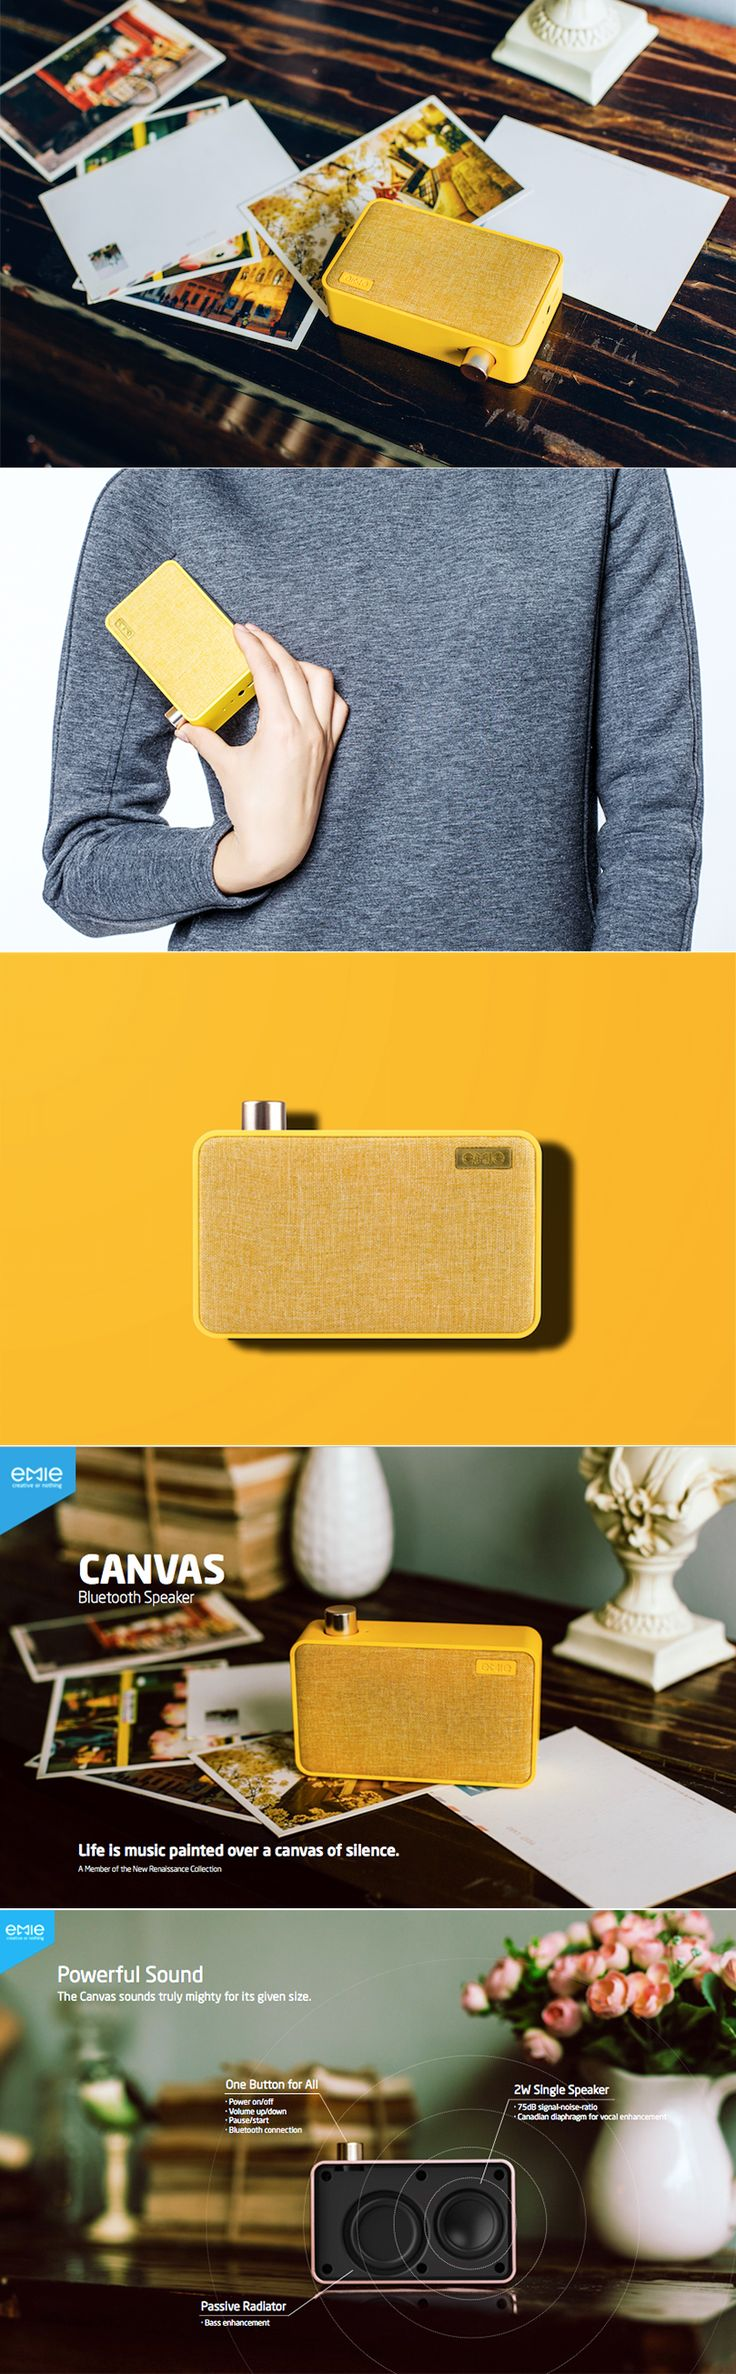 593 best Audio images on Pinterest | Product design, Speaker design ...